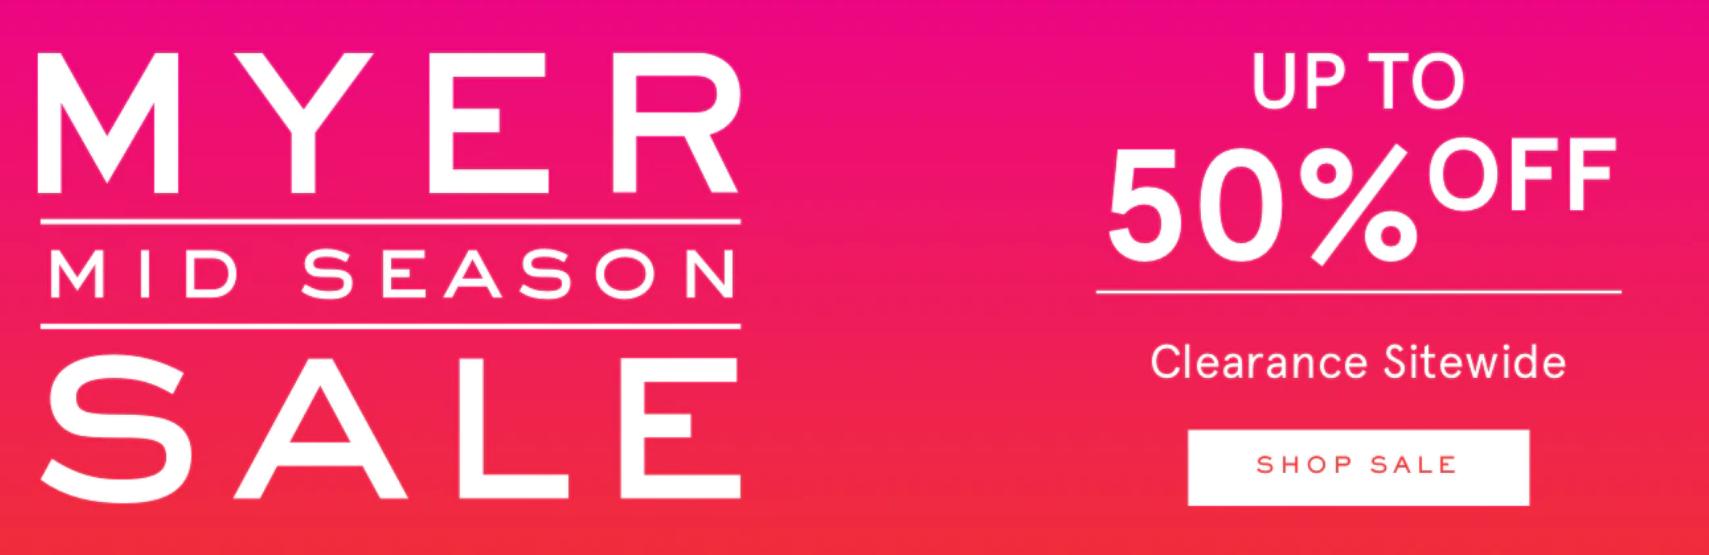 Myer - The Mega Shoe Sale (Min 40% off) | Mid Season Clearance Sale